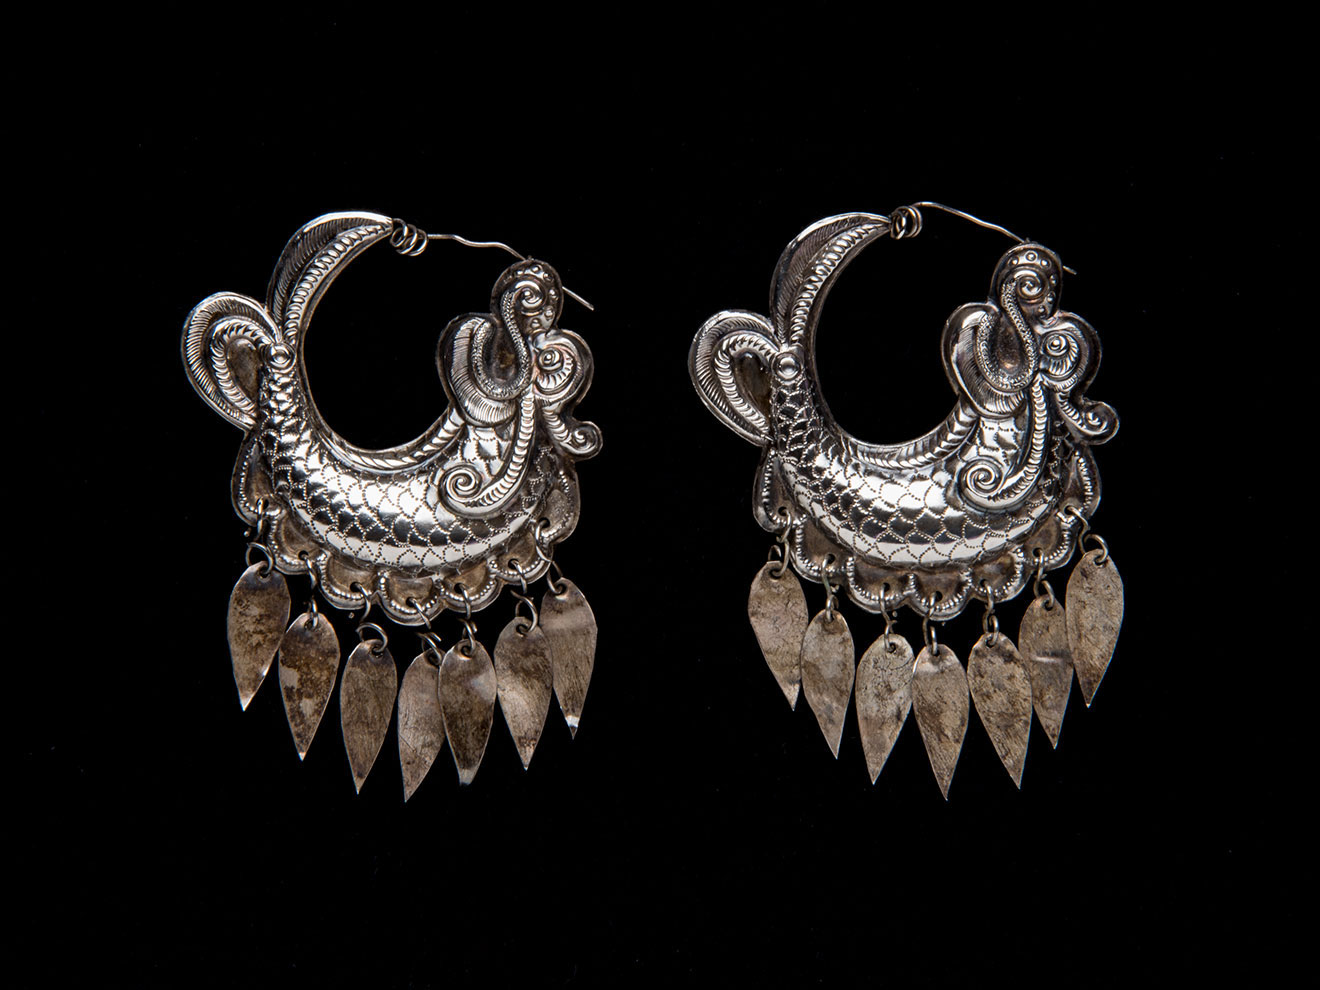 Pair of Earrings, China (Miao)